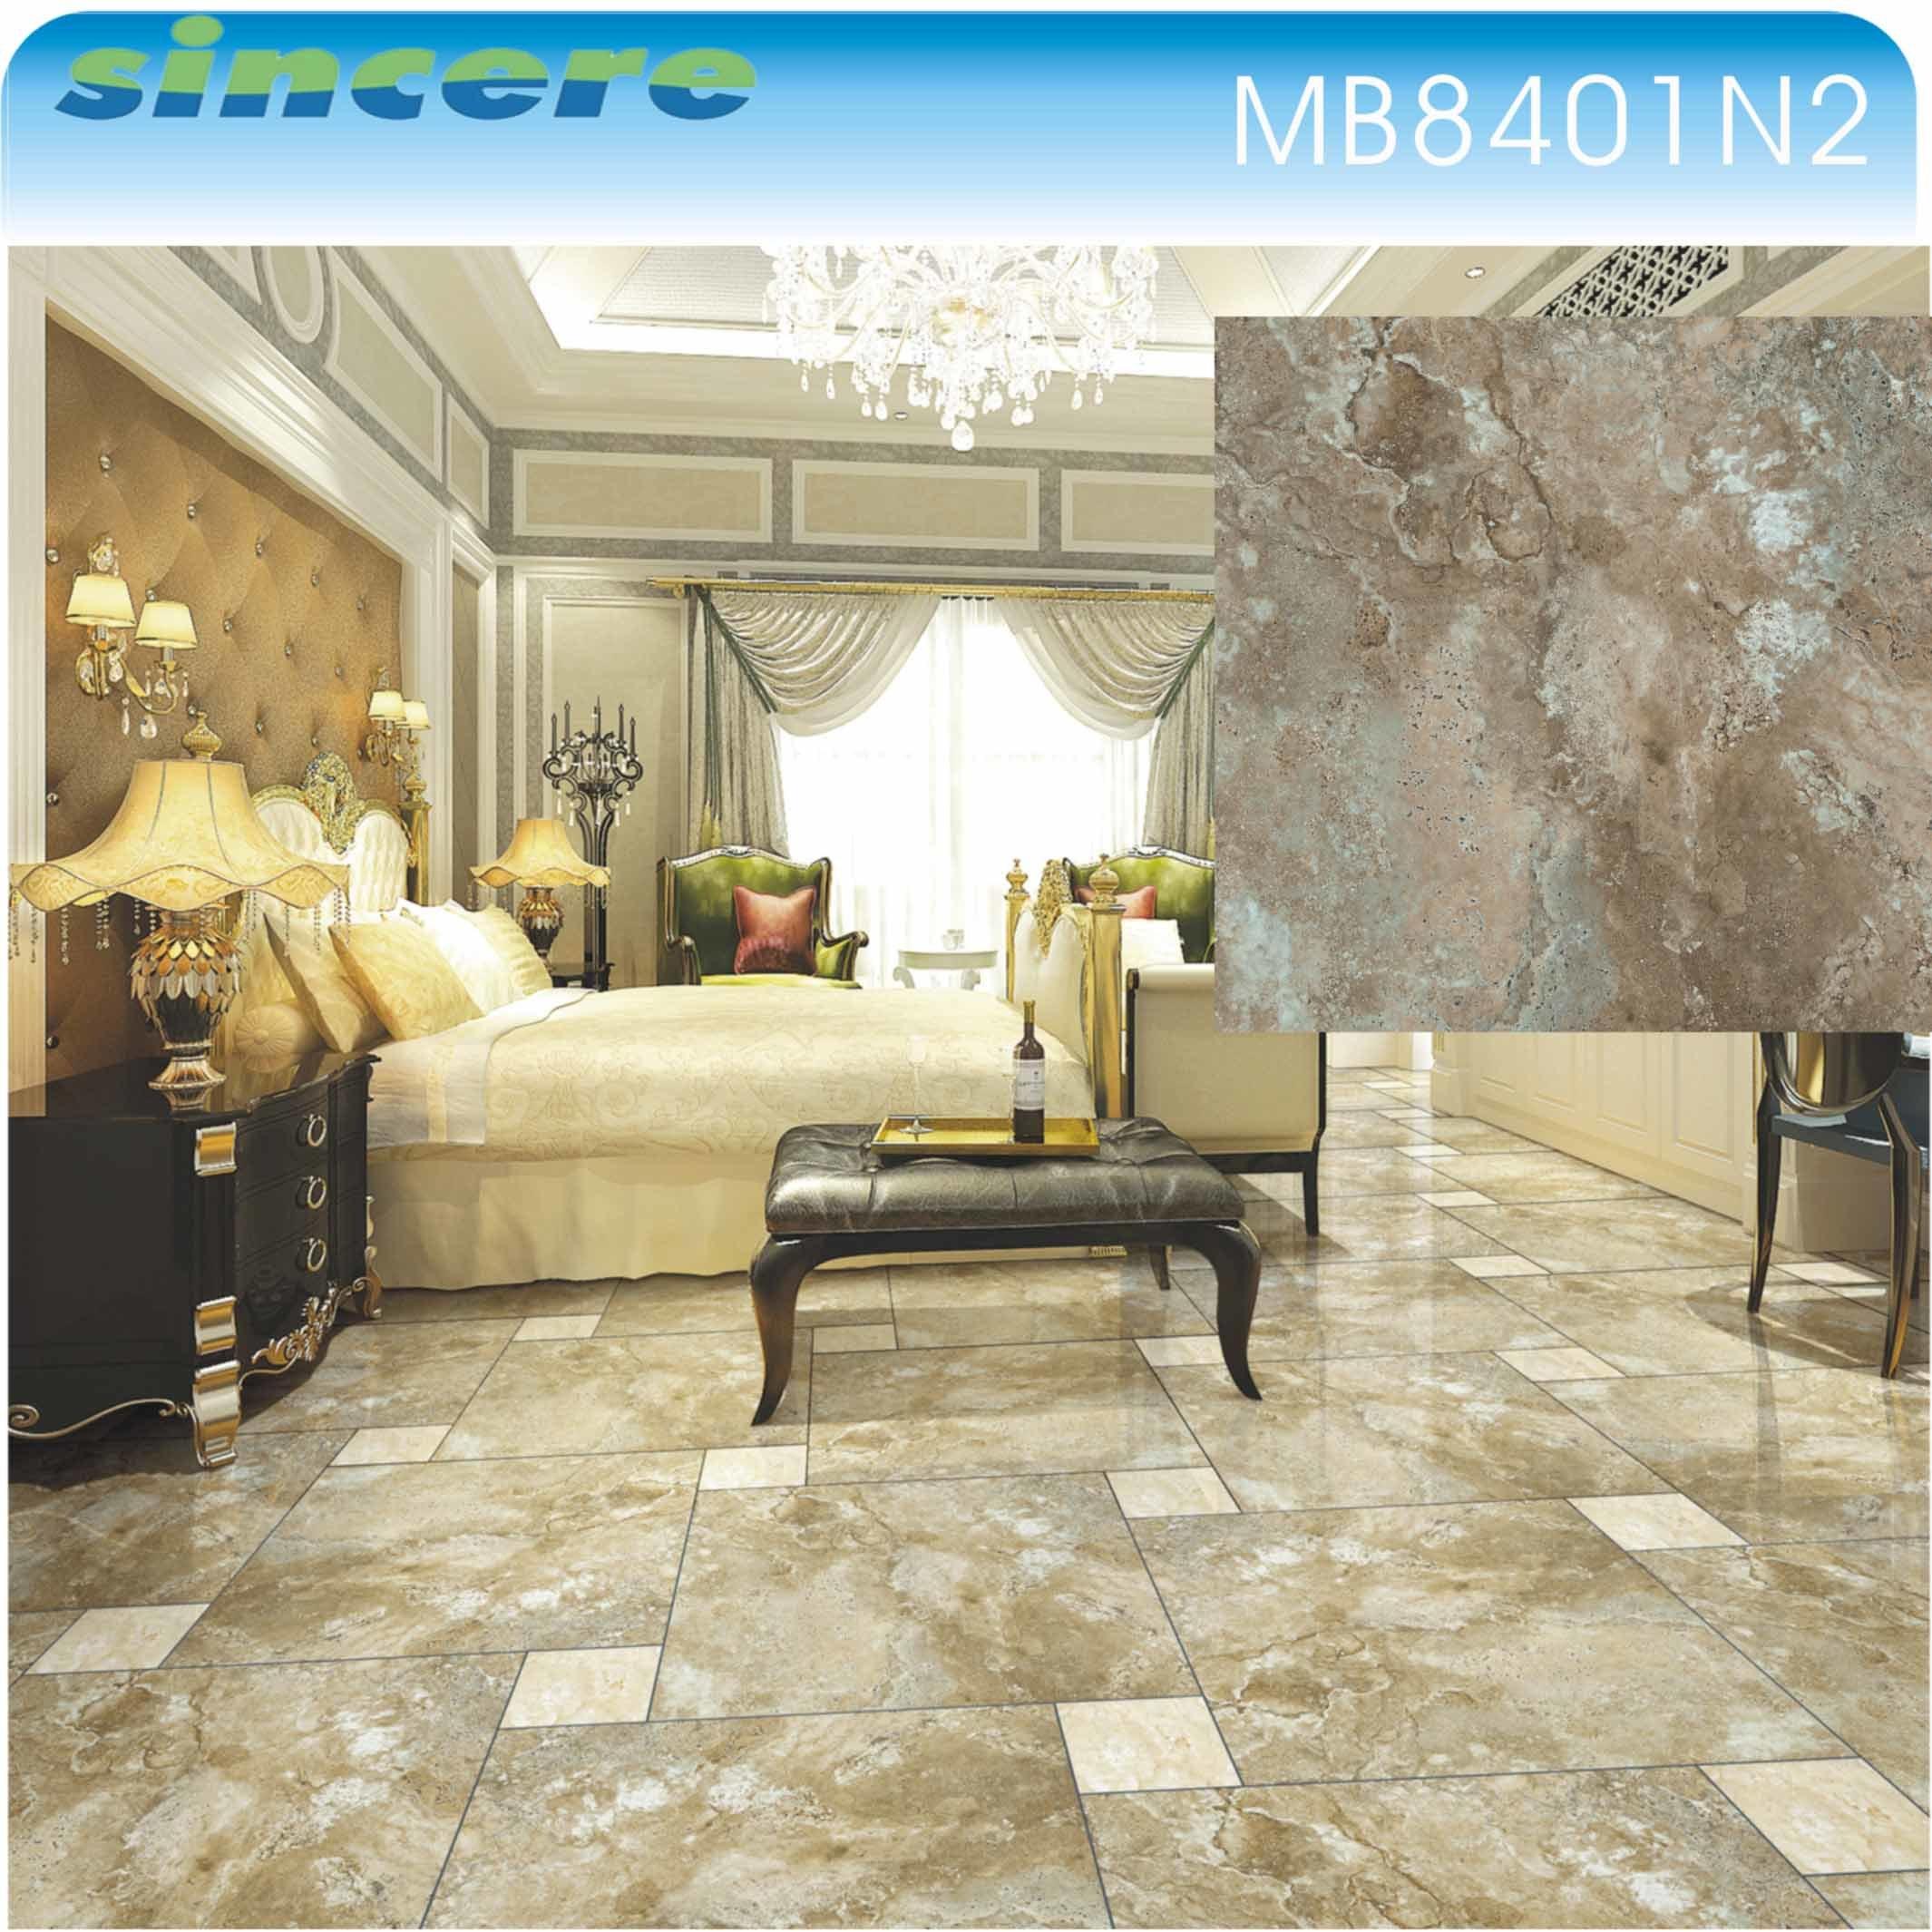 Best shiny grey floor tiles contemporary flooring area rugs grey high gloss floor tiles image collections home flooring design doublecrazyfo Images